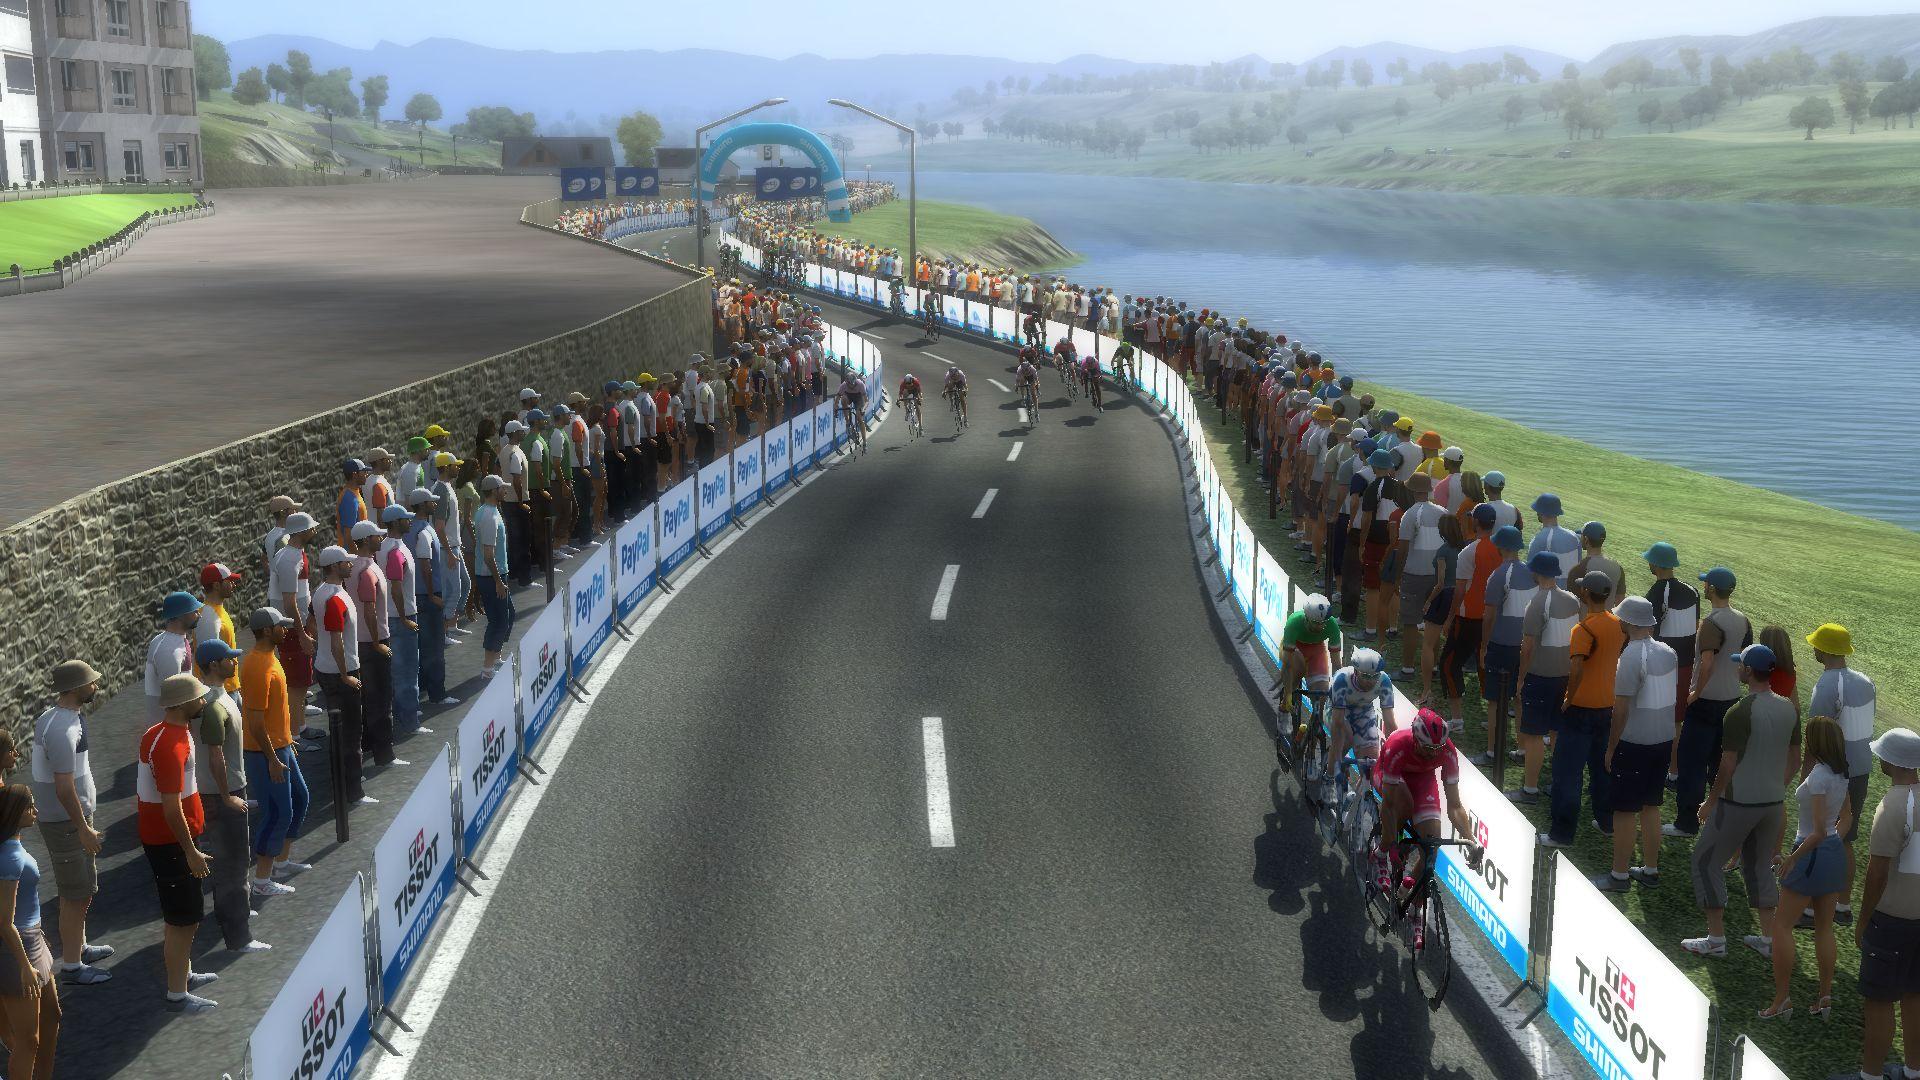 pcmdaily.com/images/mg/2018/Races/C2HC/Zuri/Zuri%2025.jpg